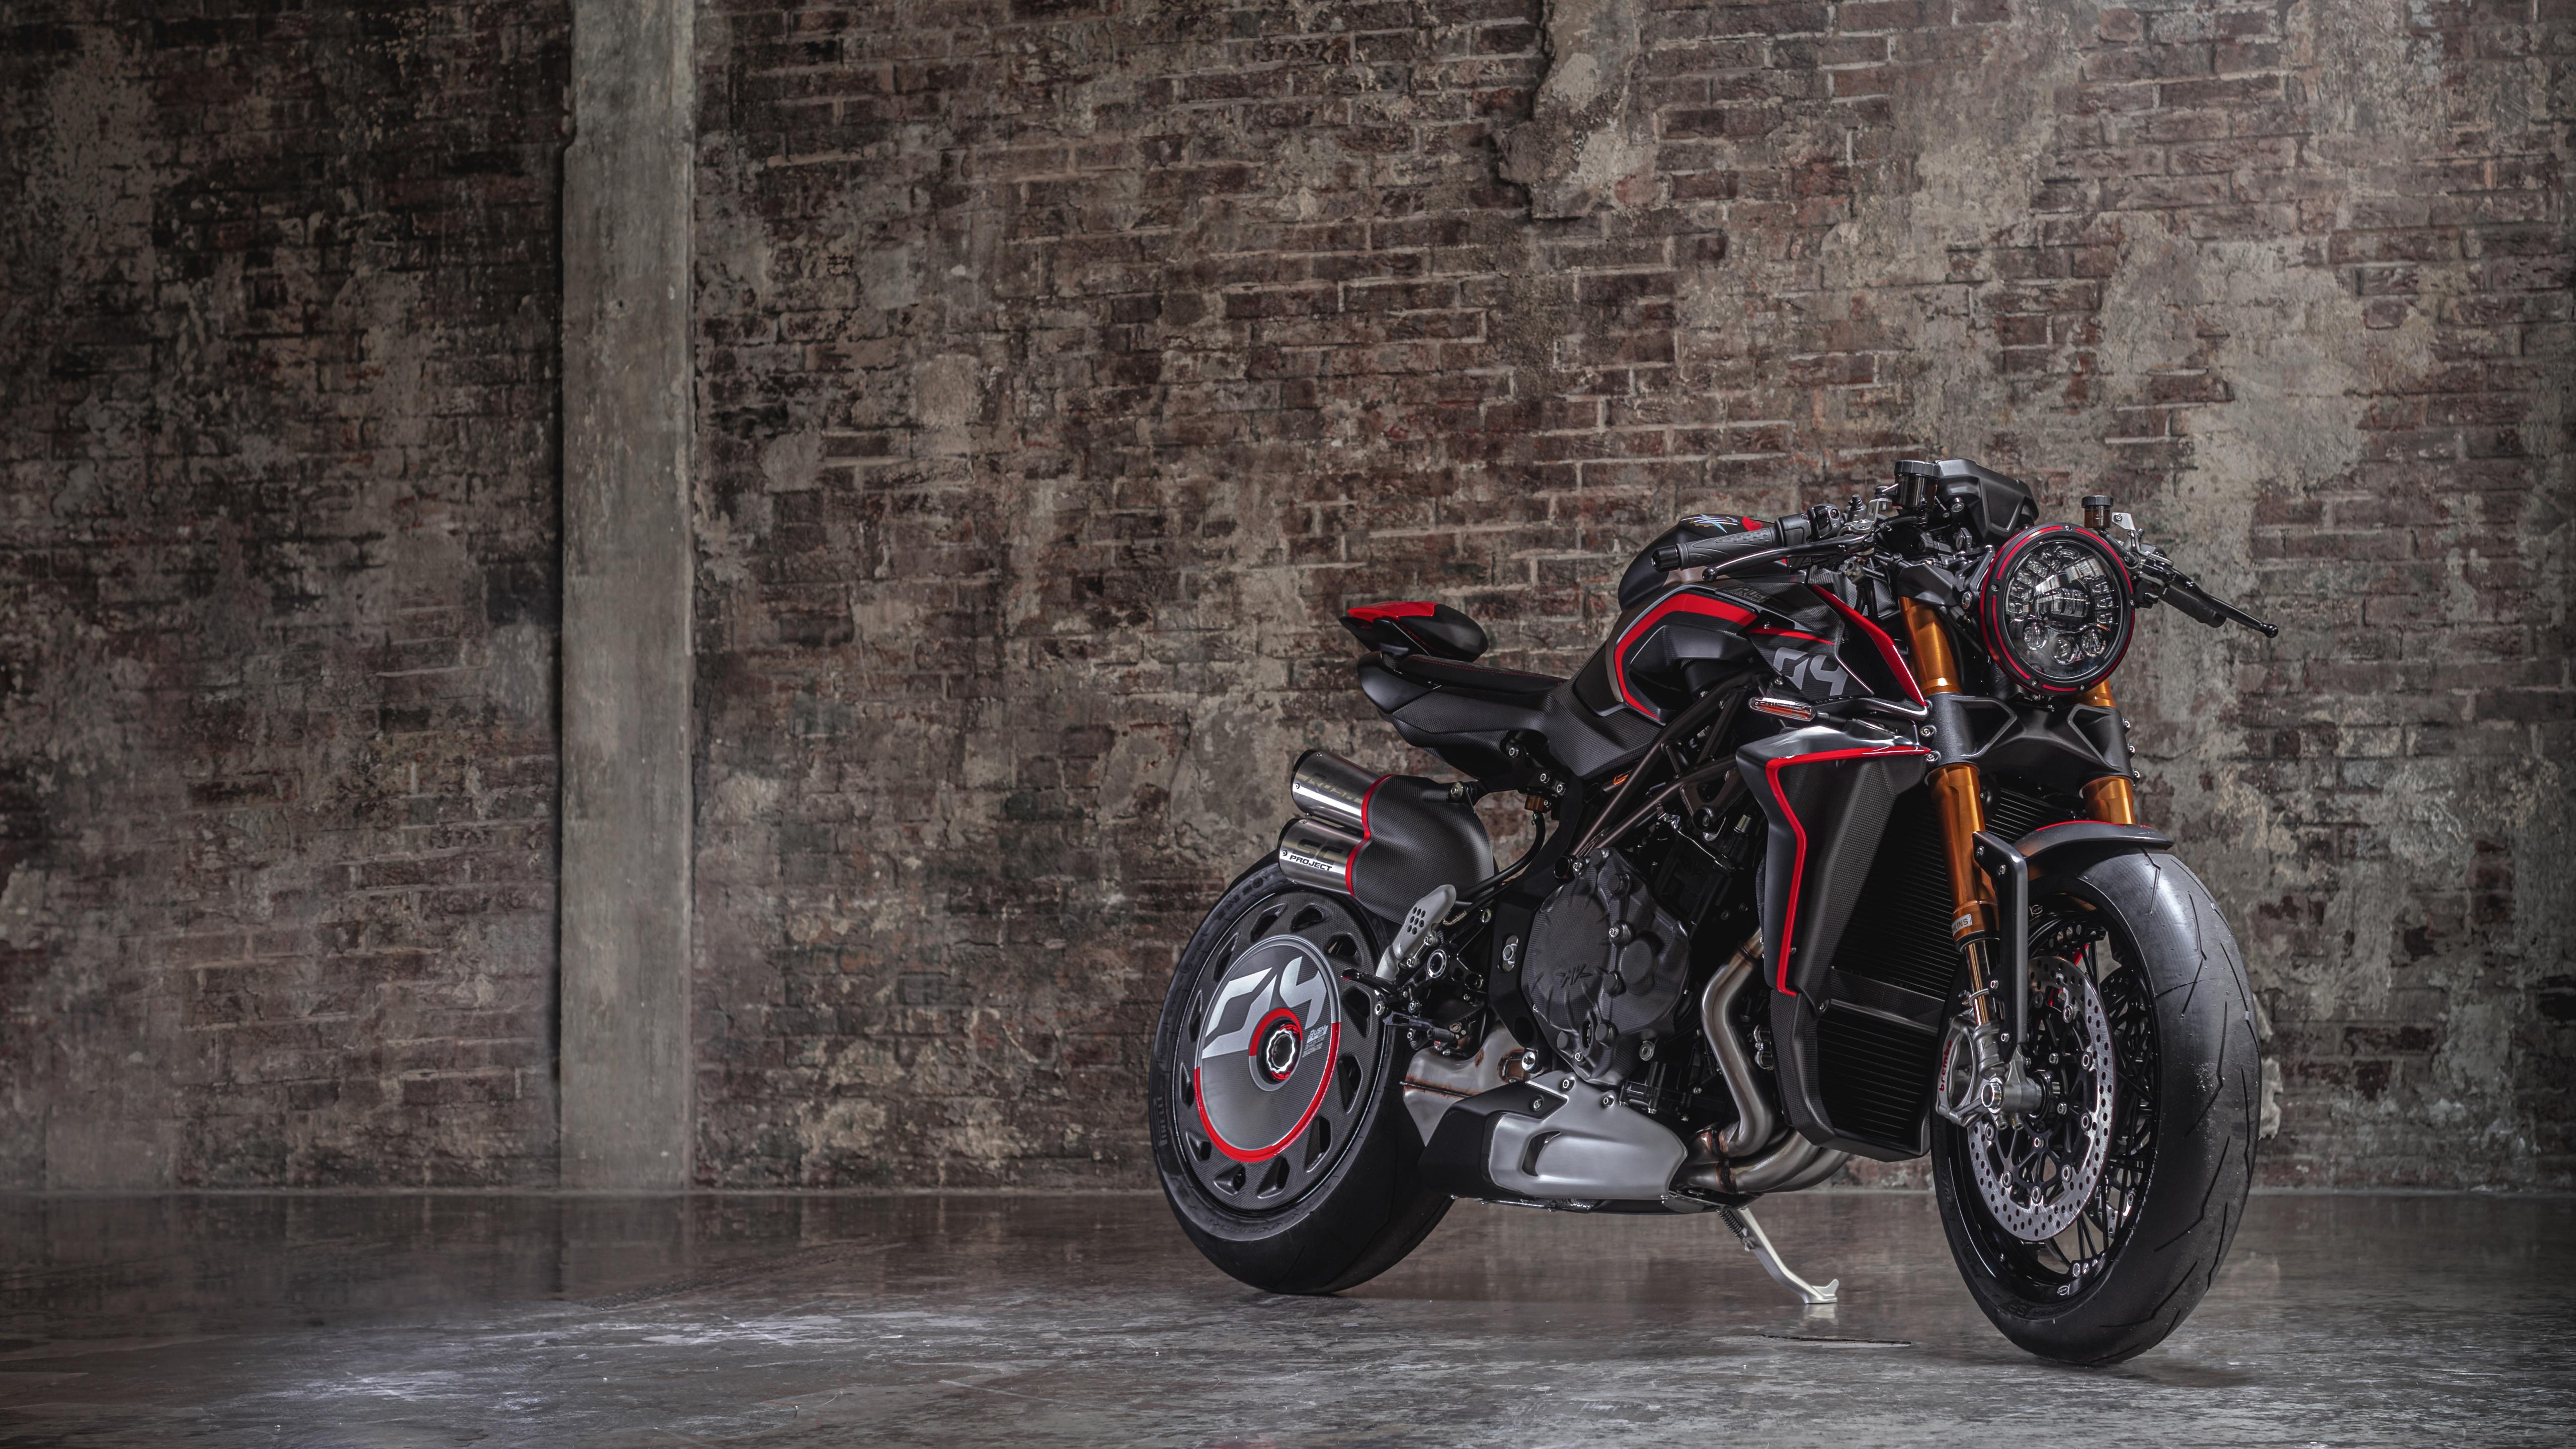 Mv Agusta Rush 1000 Wallpaper 4k 2020 5k Bikes 1264 Mv agusta rush 1000 2020 4k